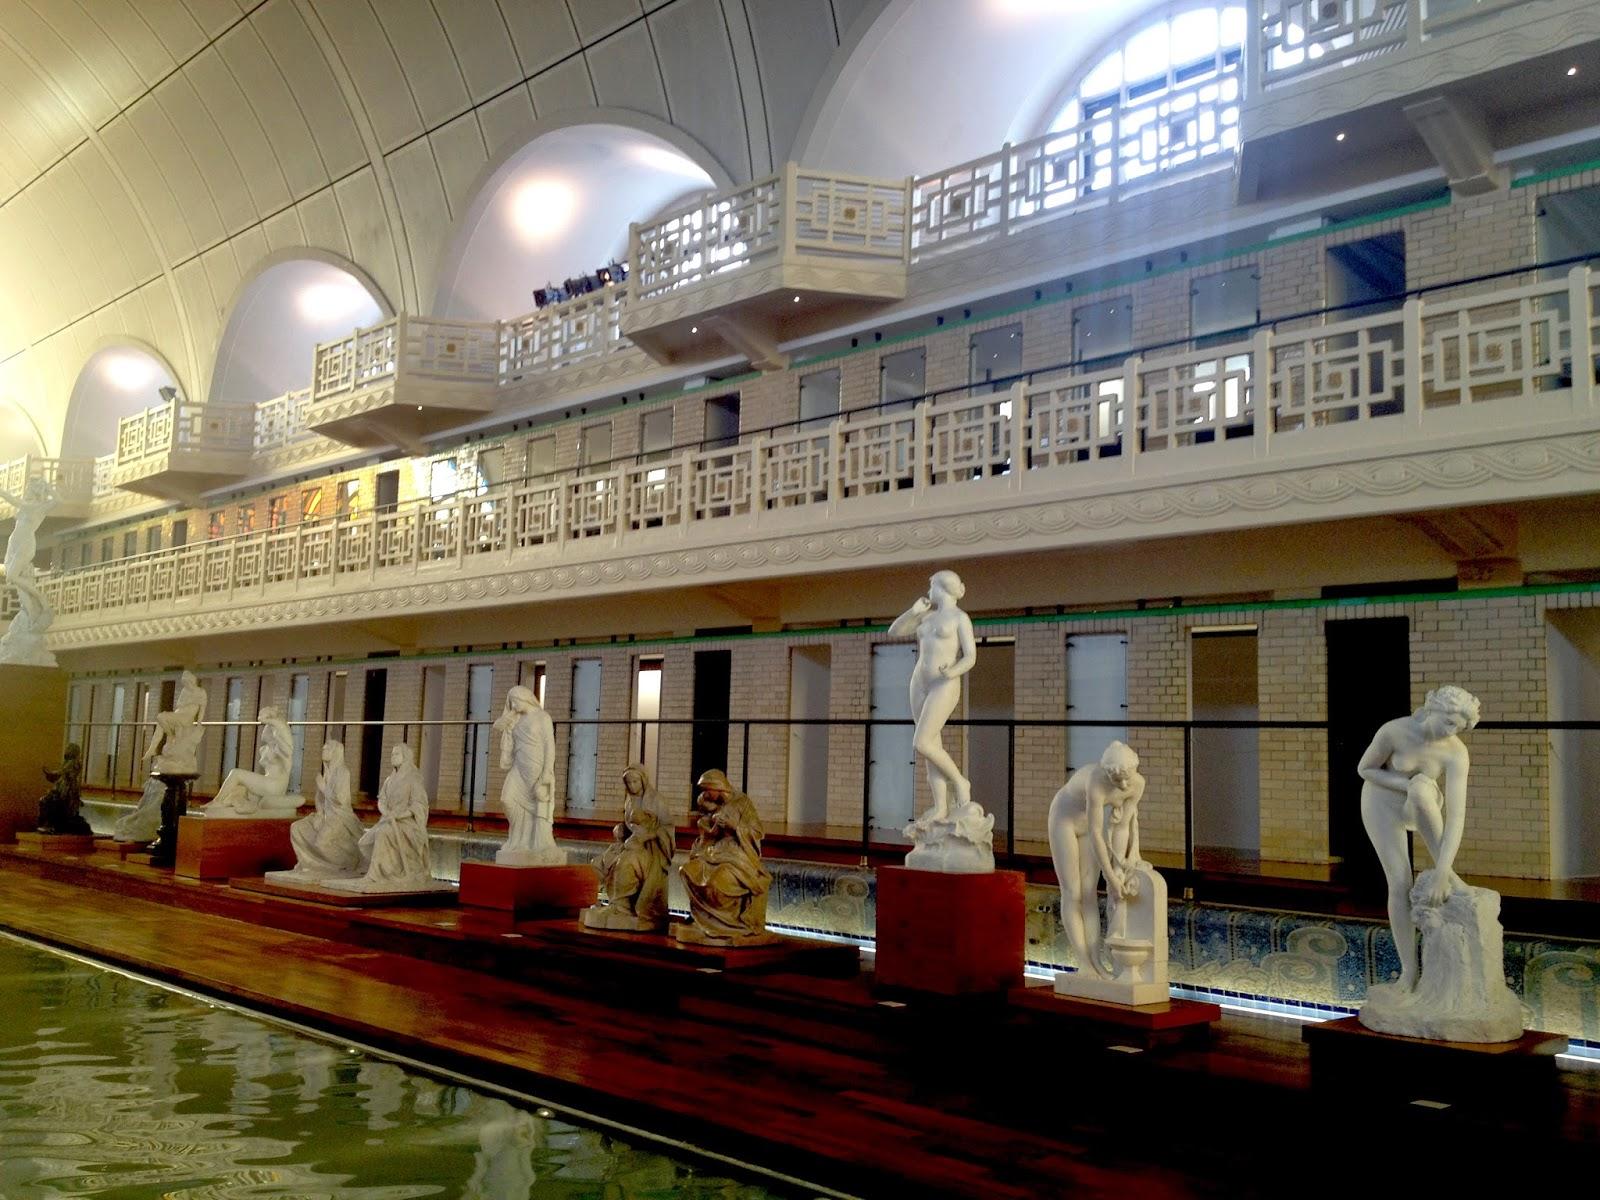 Brankopopovicblog encounter with lille france - Musee la piscine roubaix ...